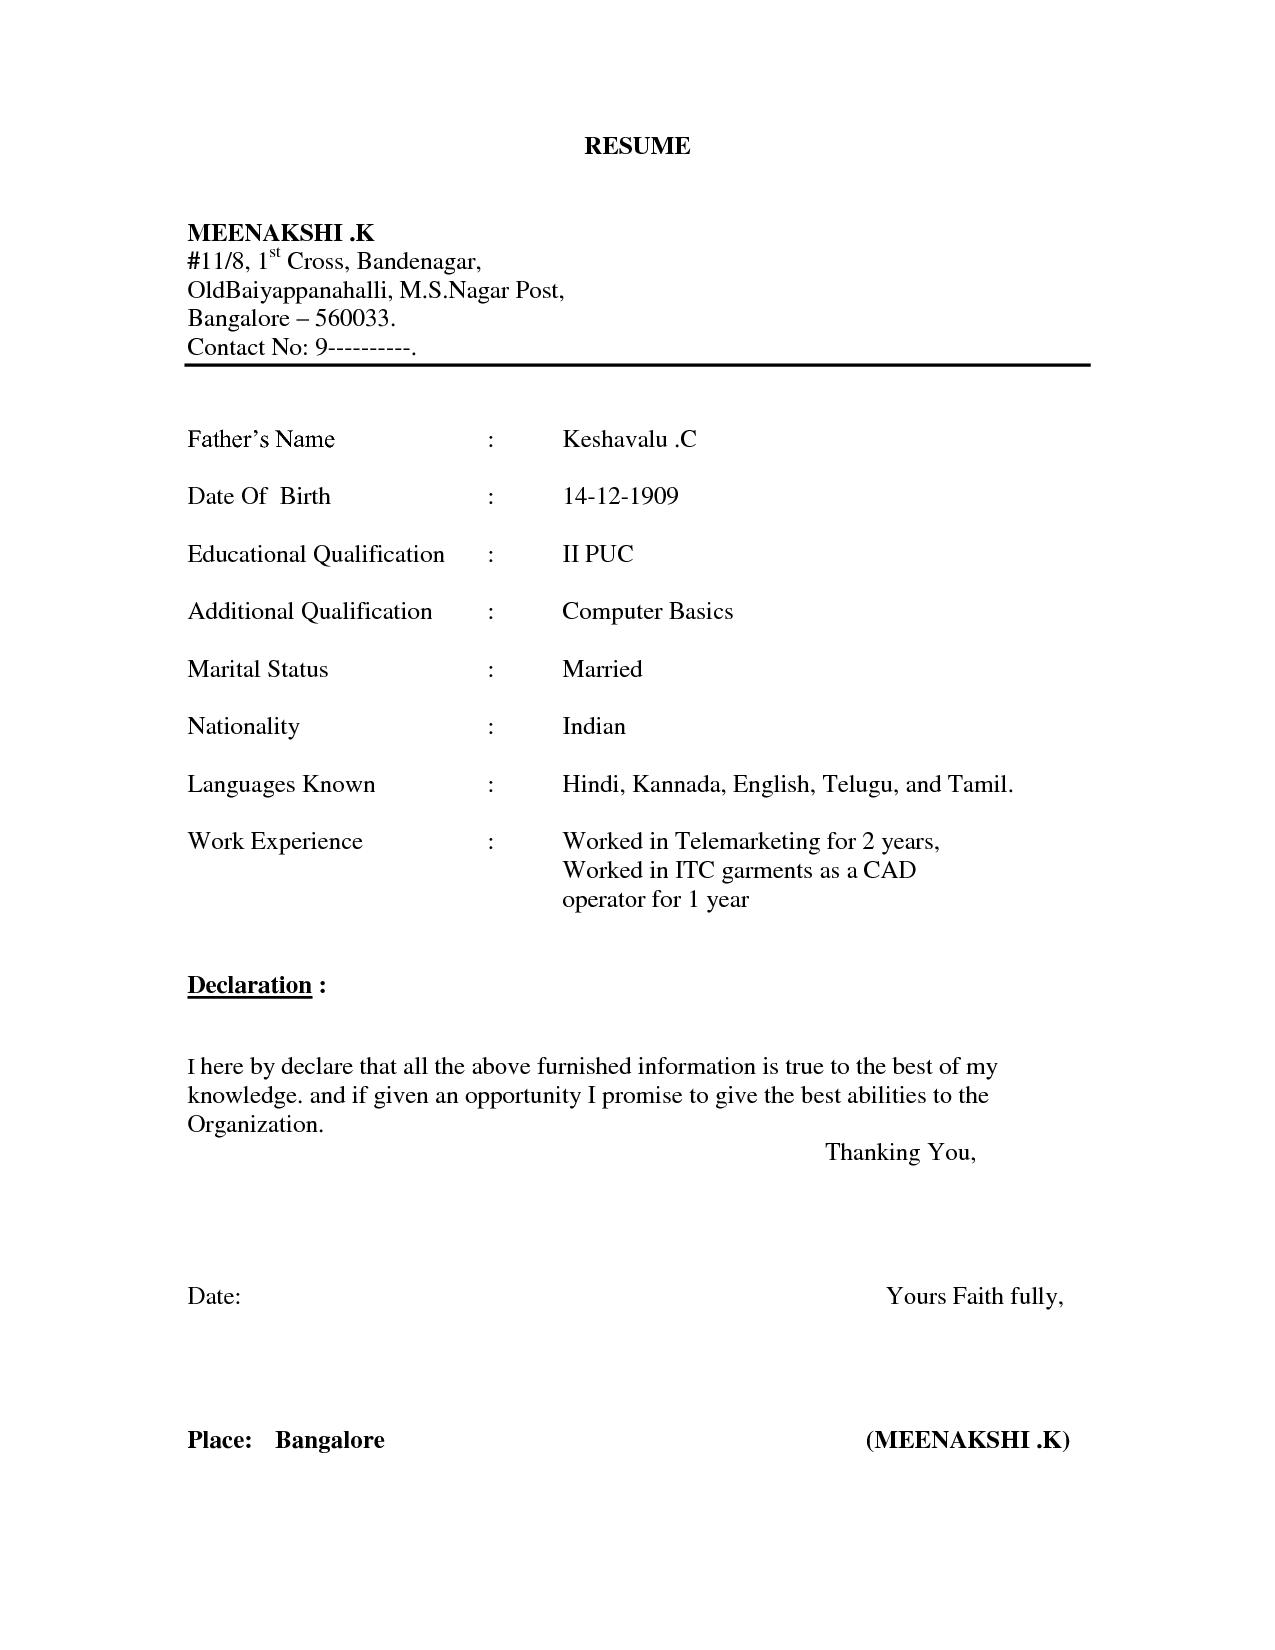 Resume Format Normal